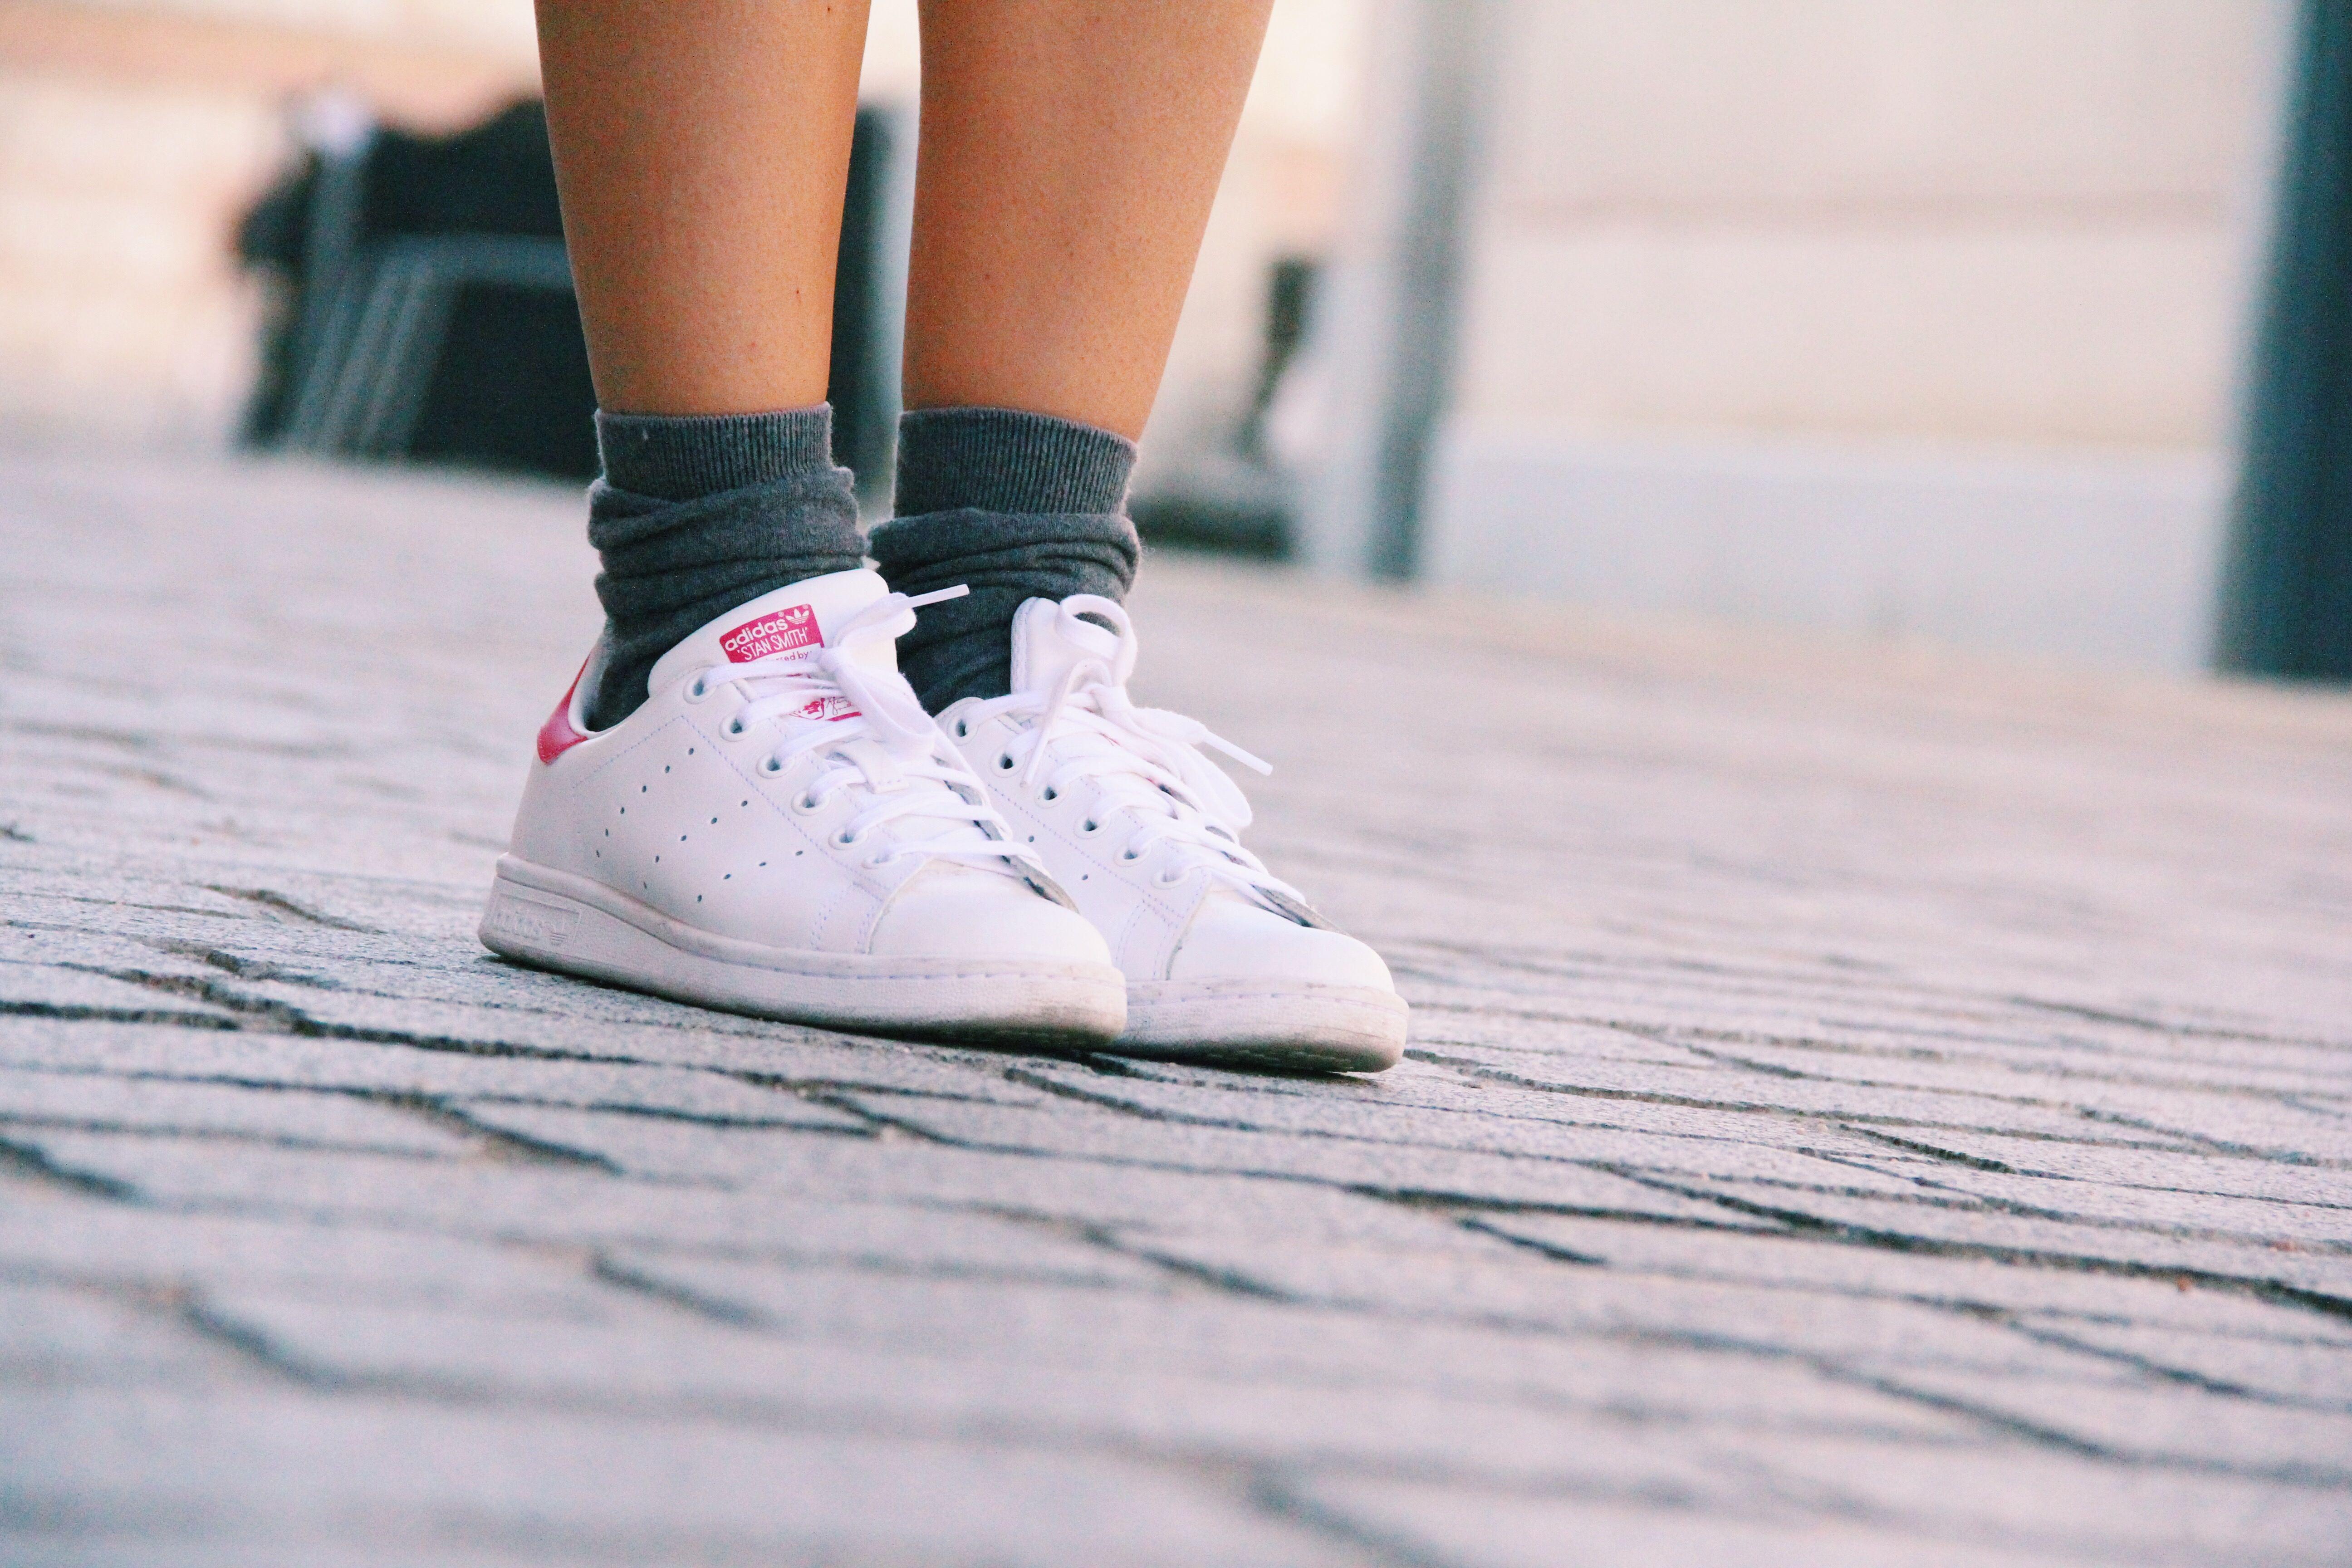 stan_smith_adidas-conjunto_de_punto_gris-grey-zapatillas_blancas_how_to_combine_white_sneackers-compañia_fantastica-jersey_de_punto-como_combinar_zapatillas_blancas